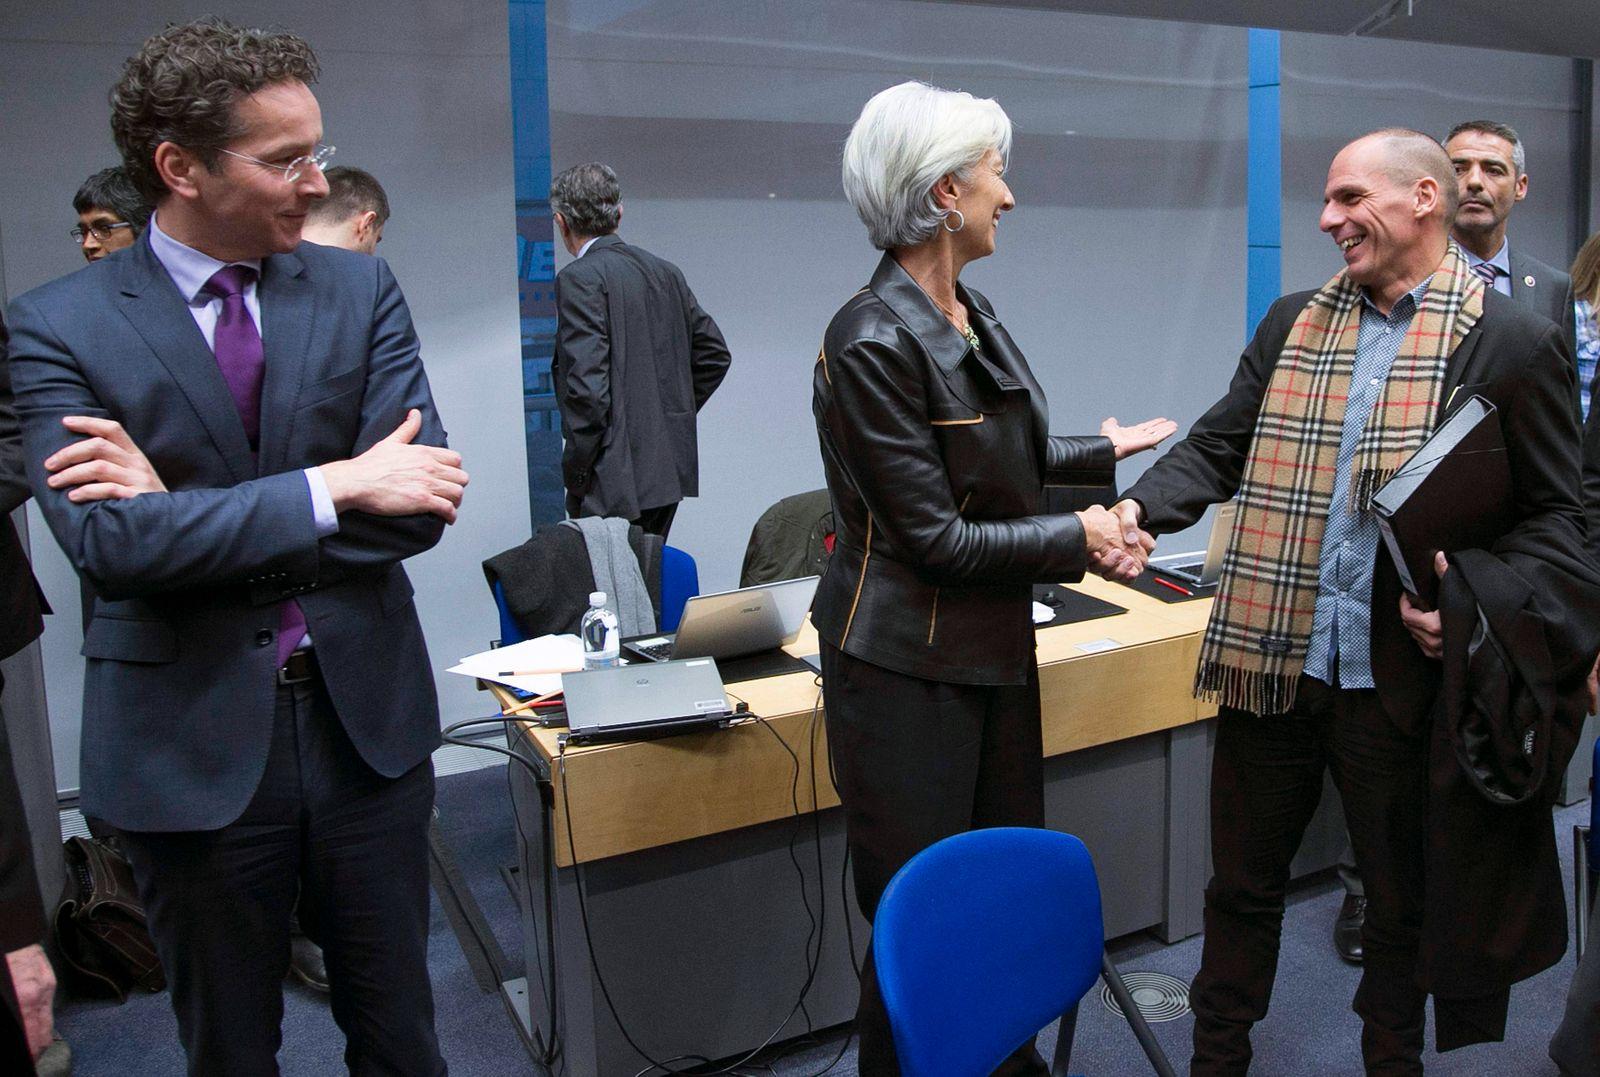 Varoufakis / Lagarde / Dijsselbloem